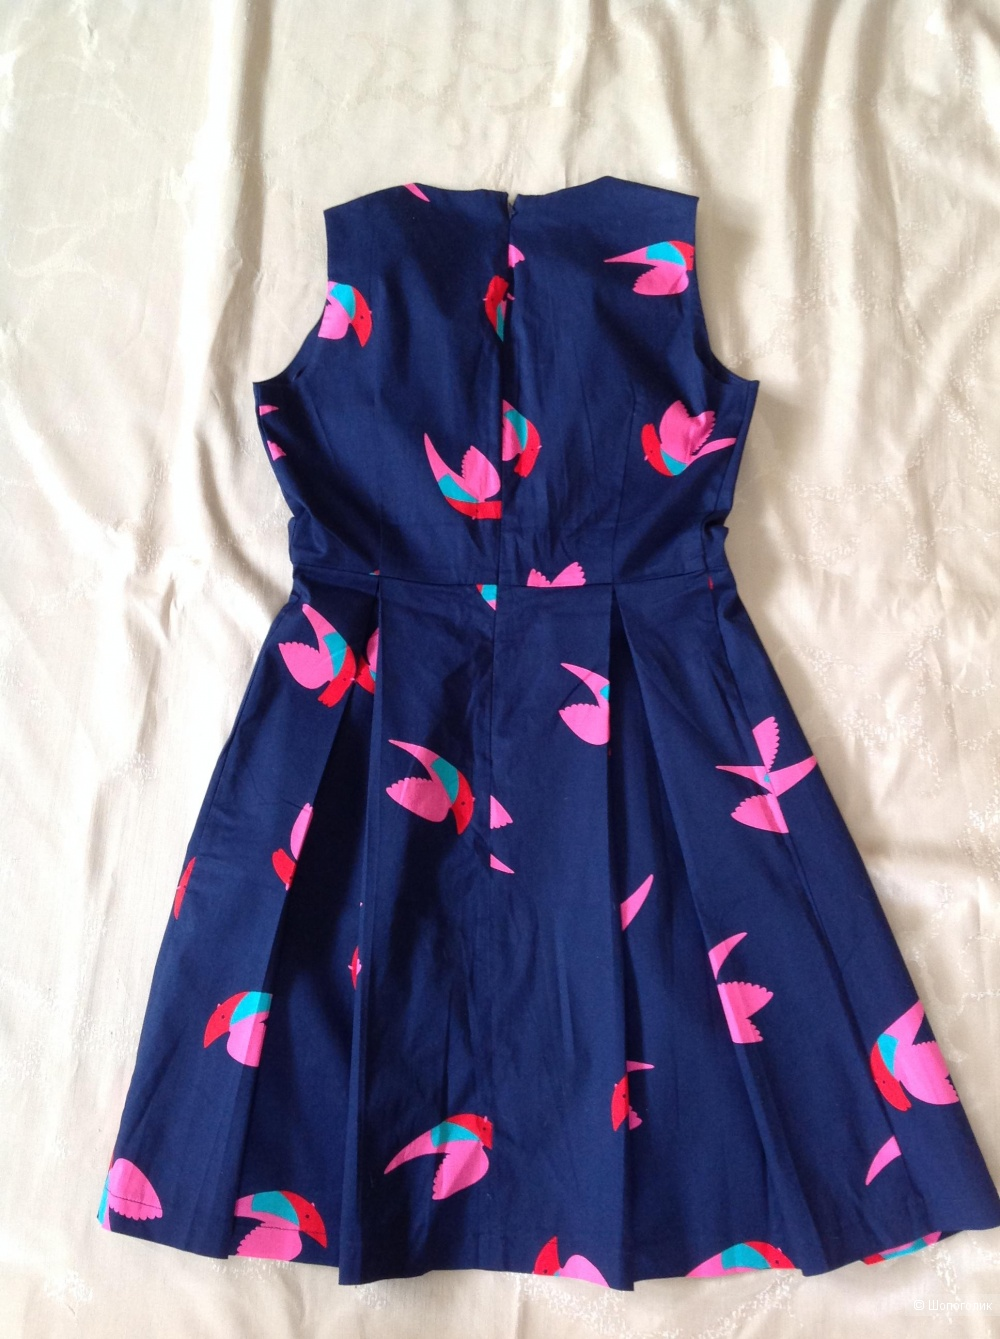 Платье Oodji, размер 44-46-48